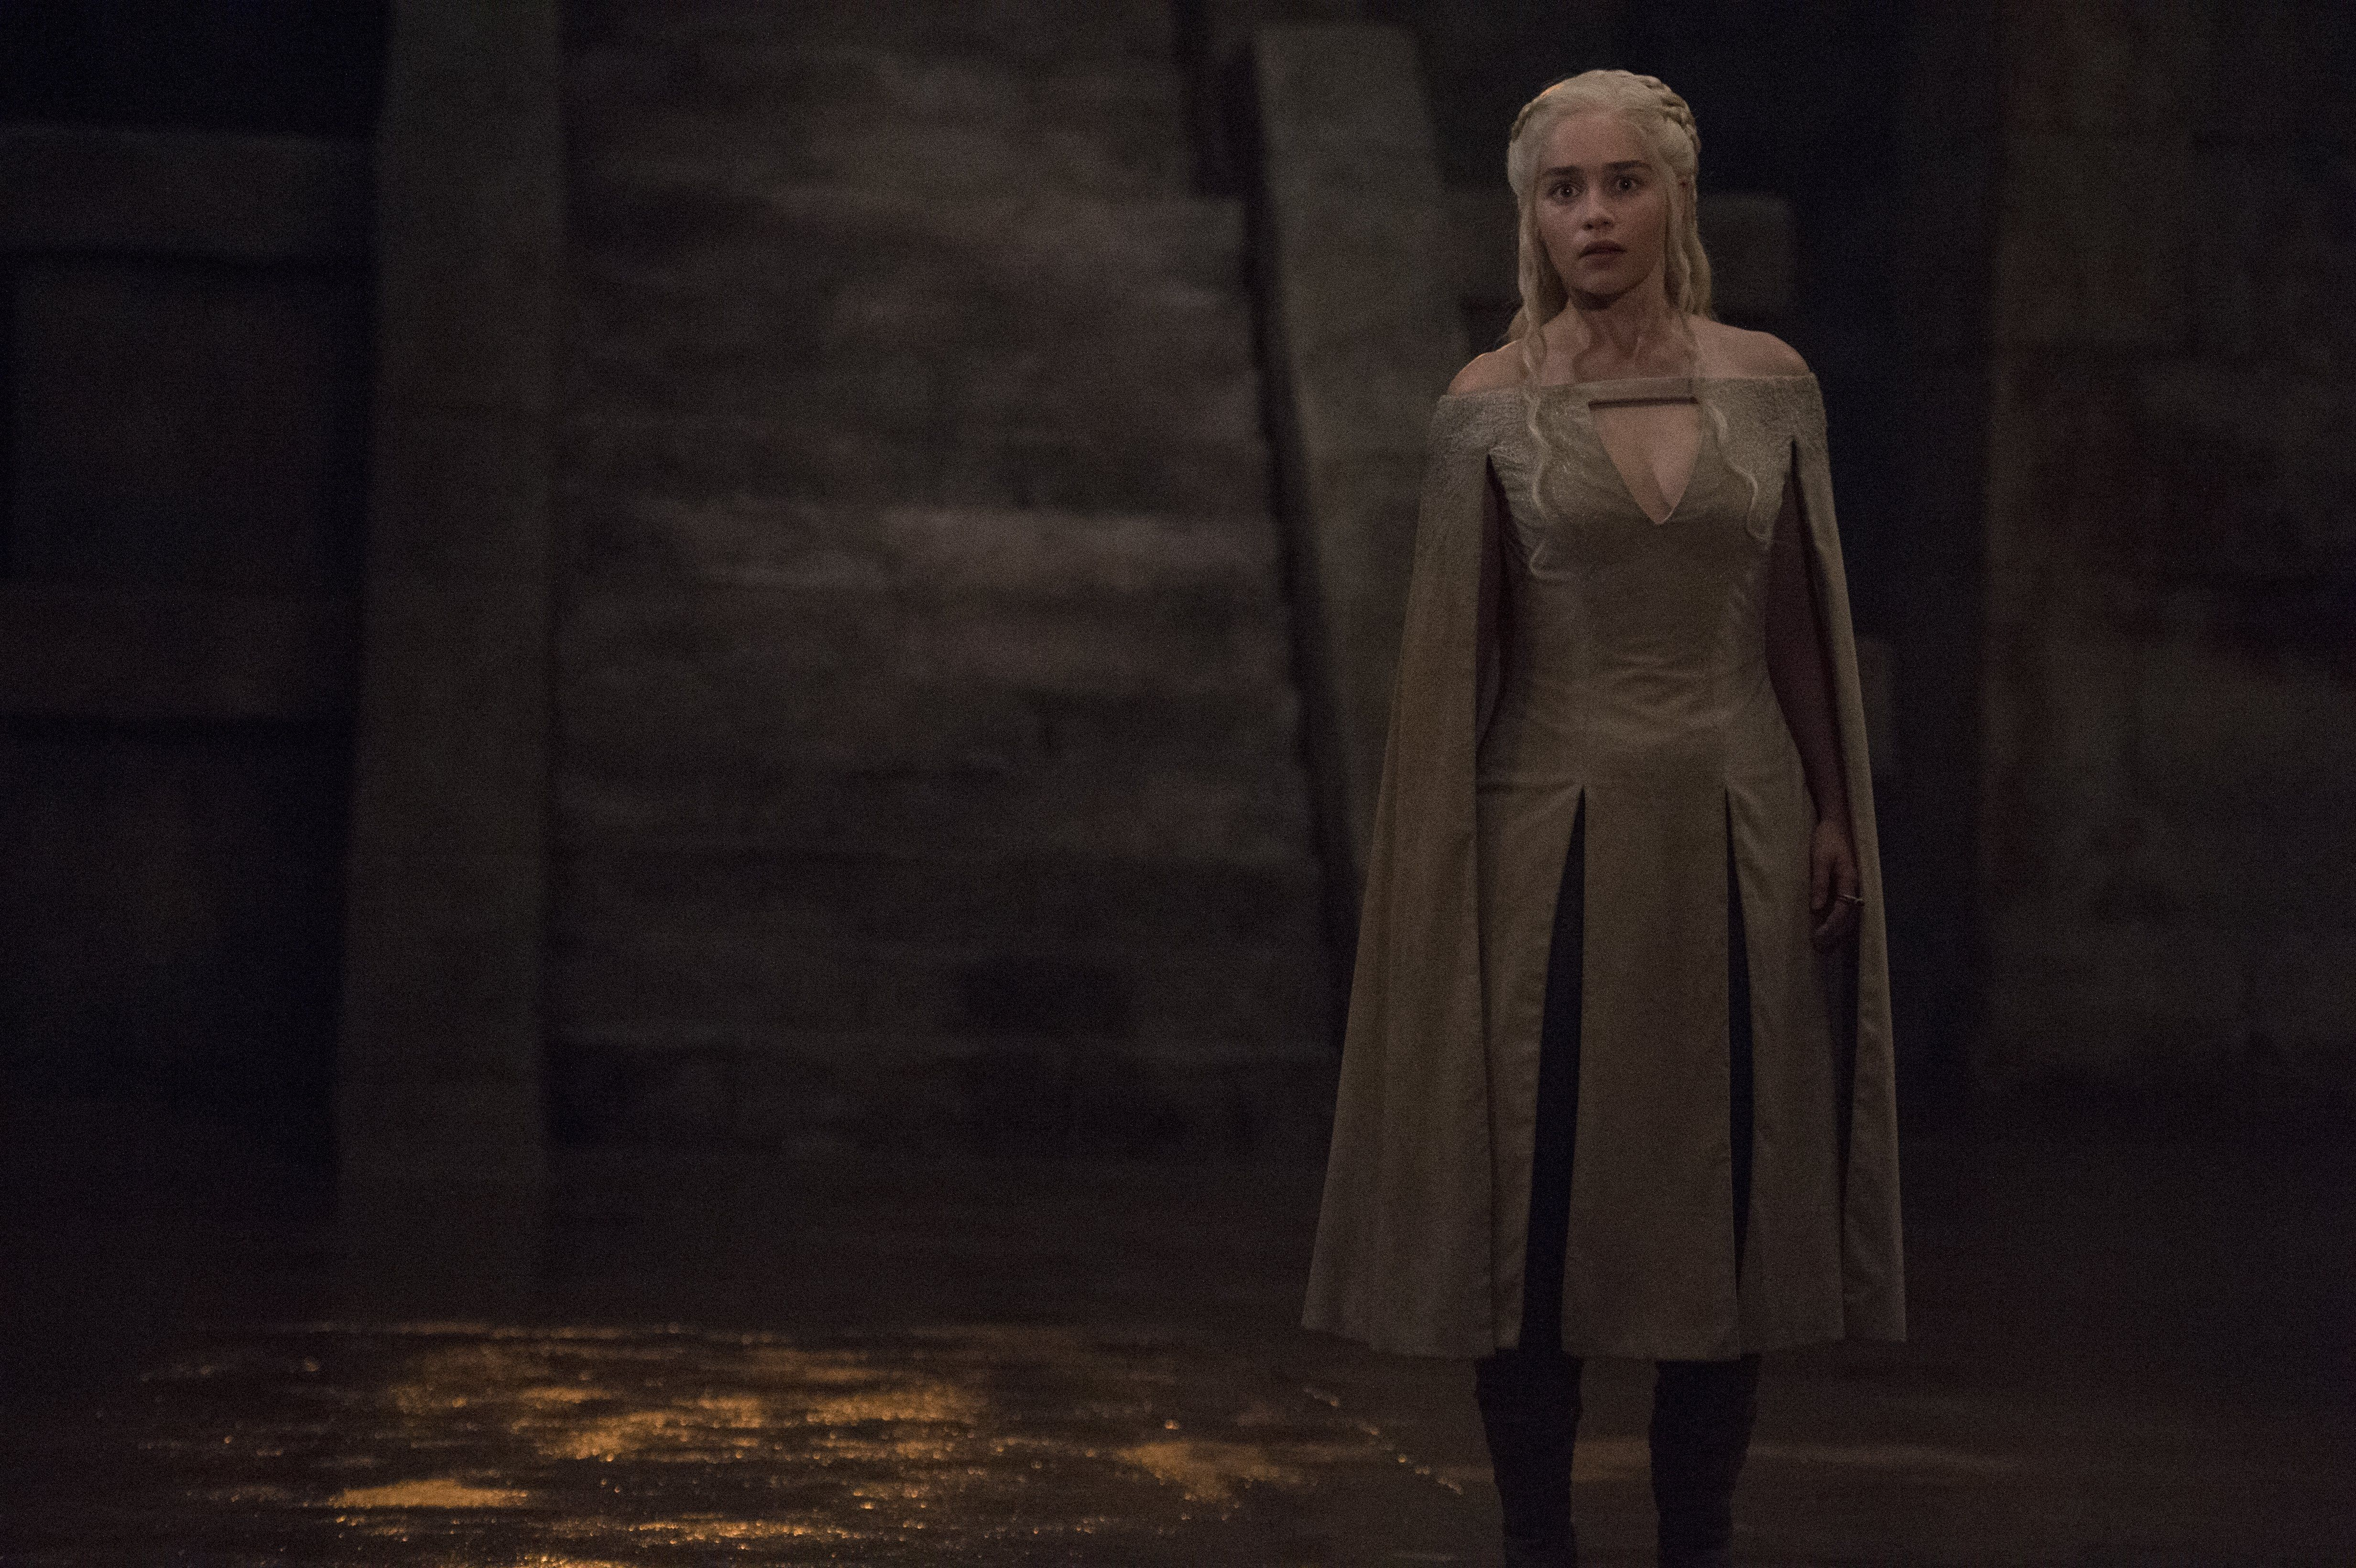 Daenerys-Targaryen-Season-5-daenerys-targaryen-38265696-4928-3280.jpg (4928×3280)